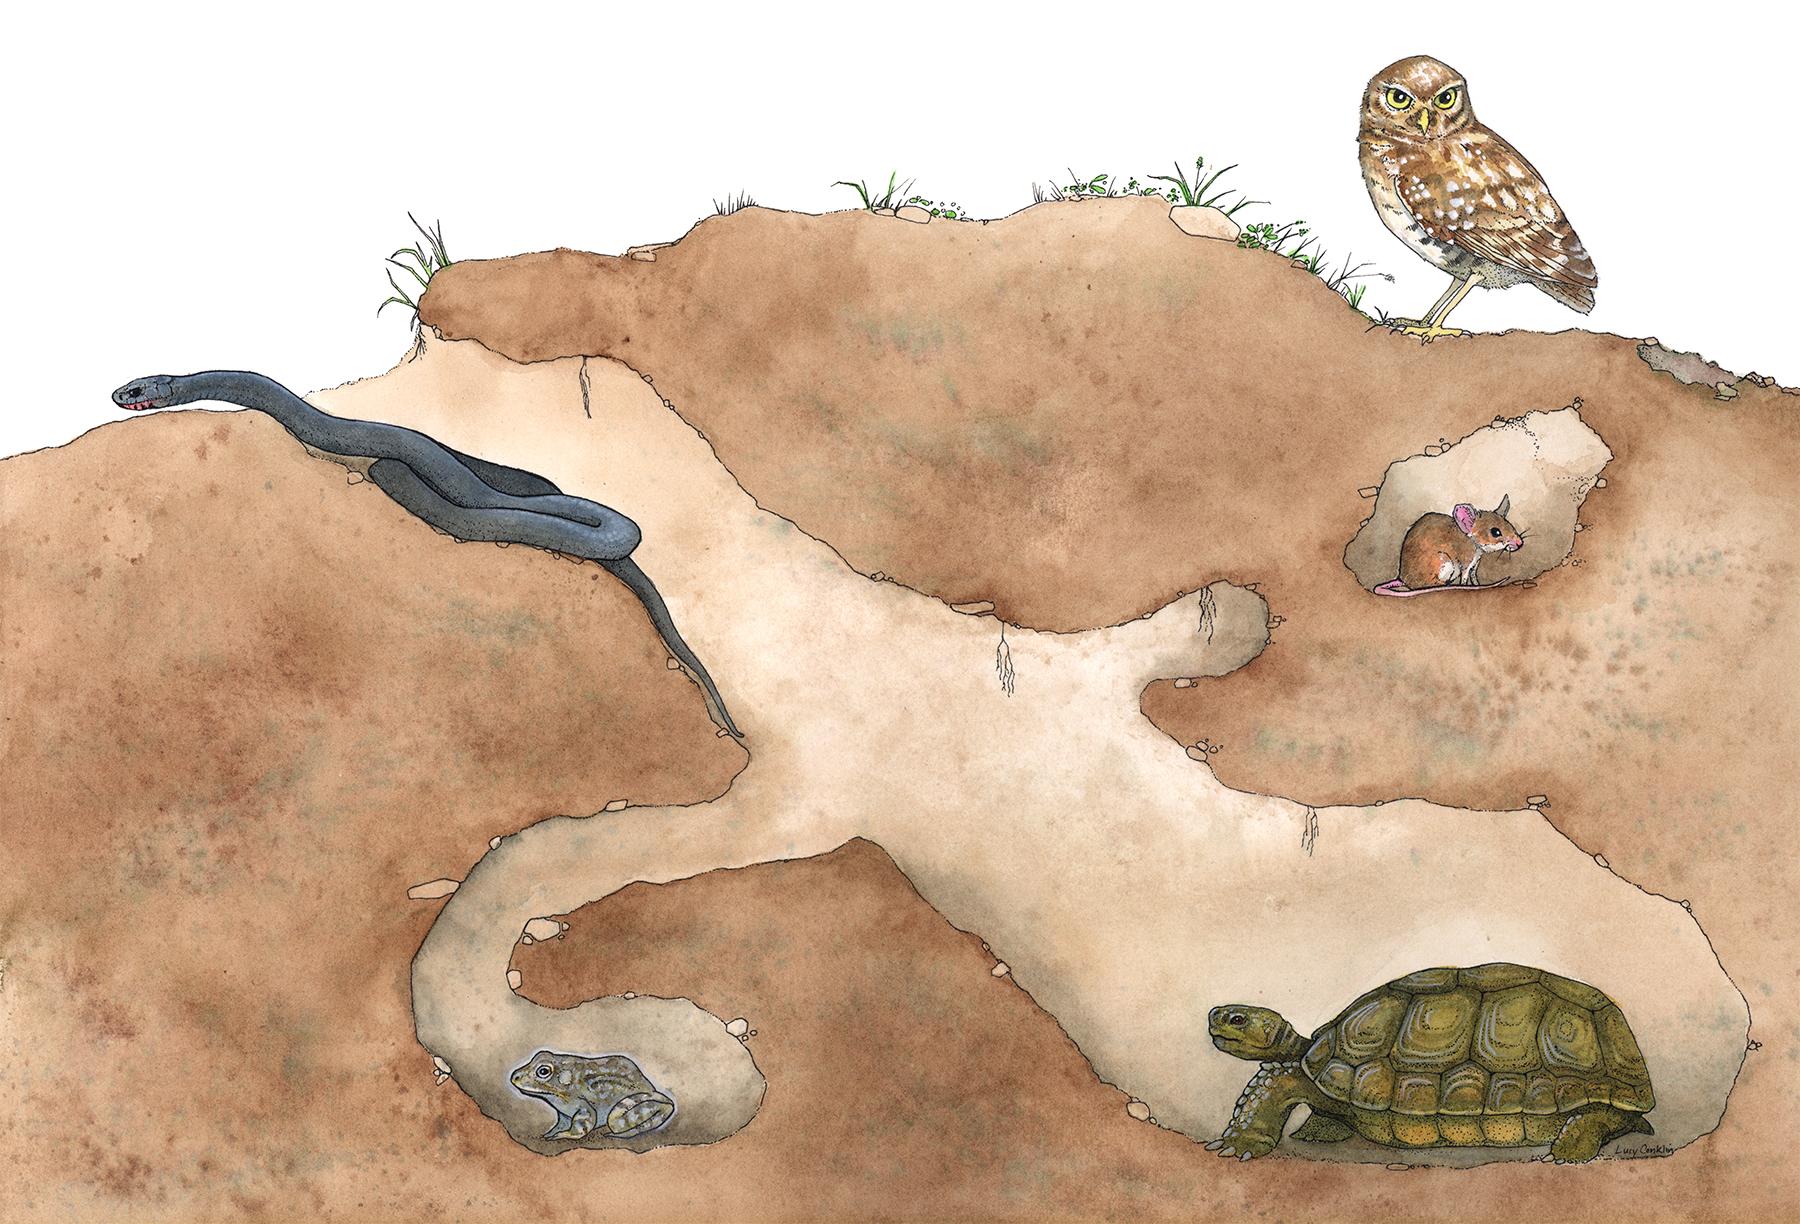 lucy conklin illustration gopher tortoise burrow